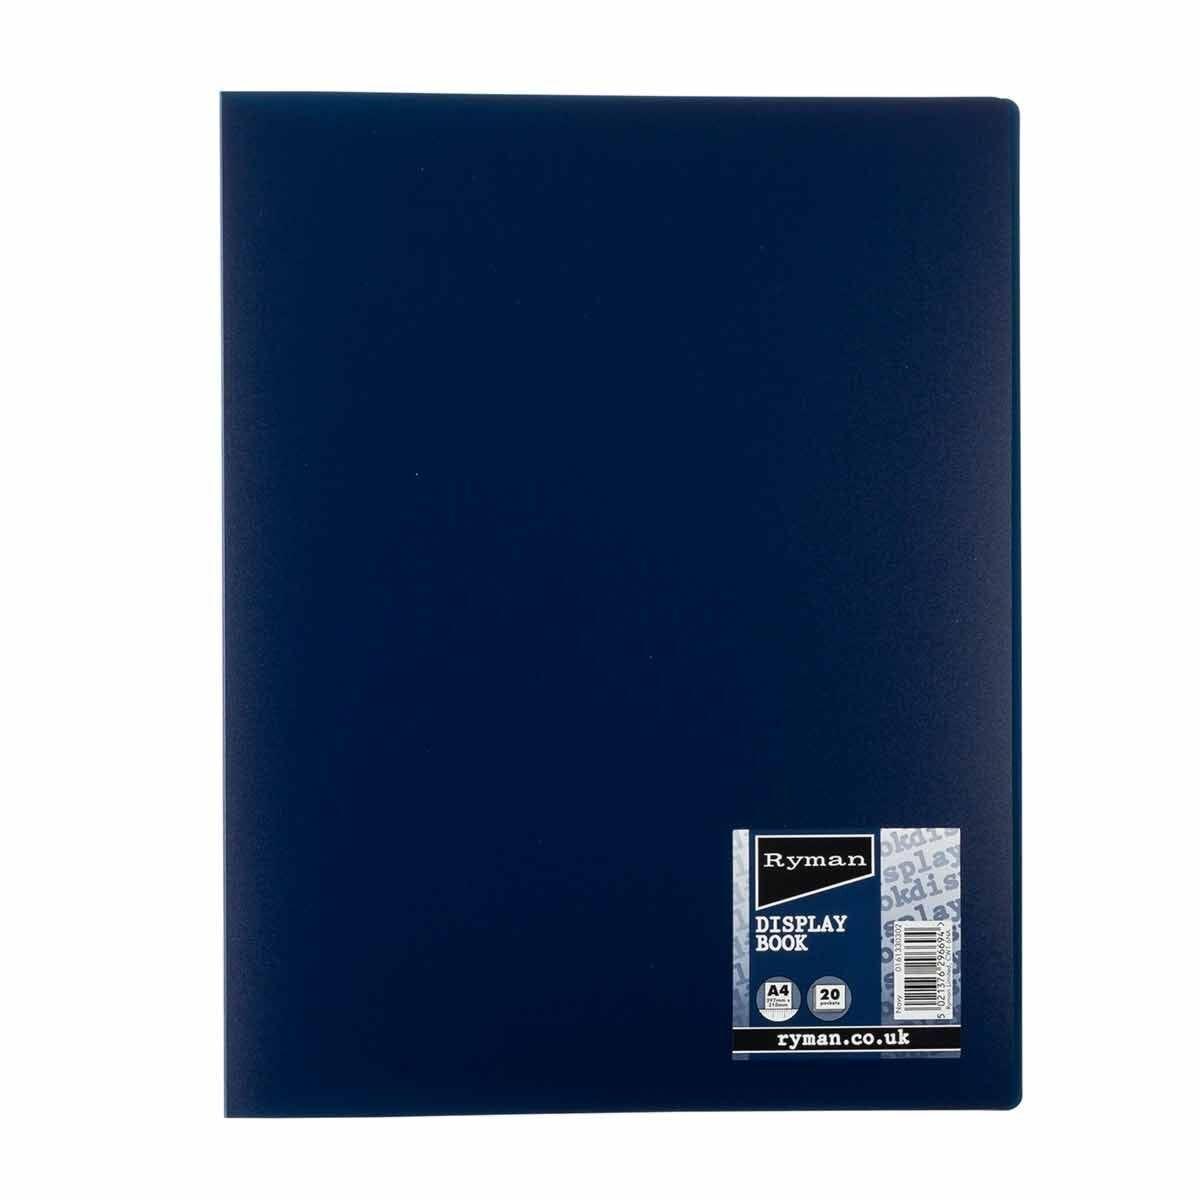 Ryman Pastel Display Book A4 Navy